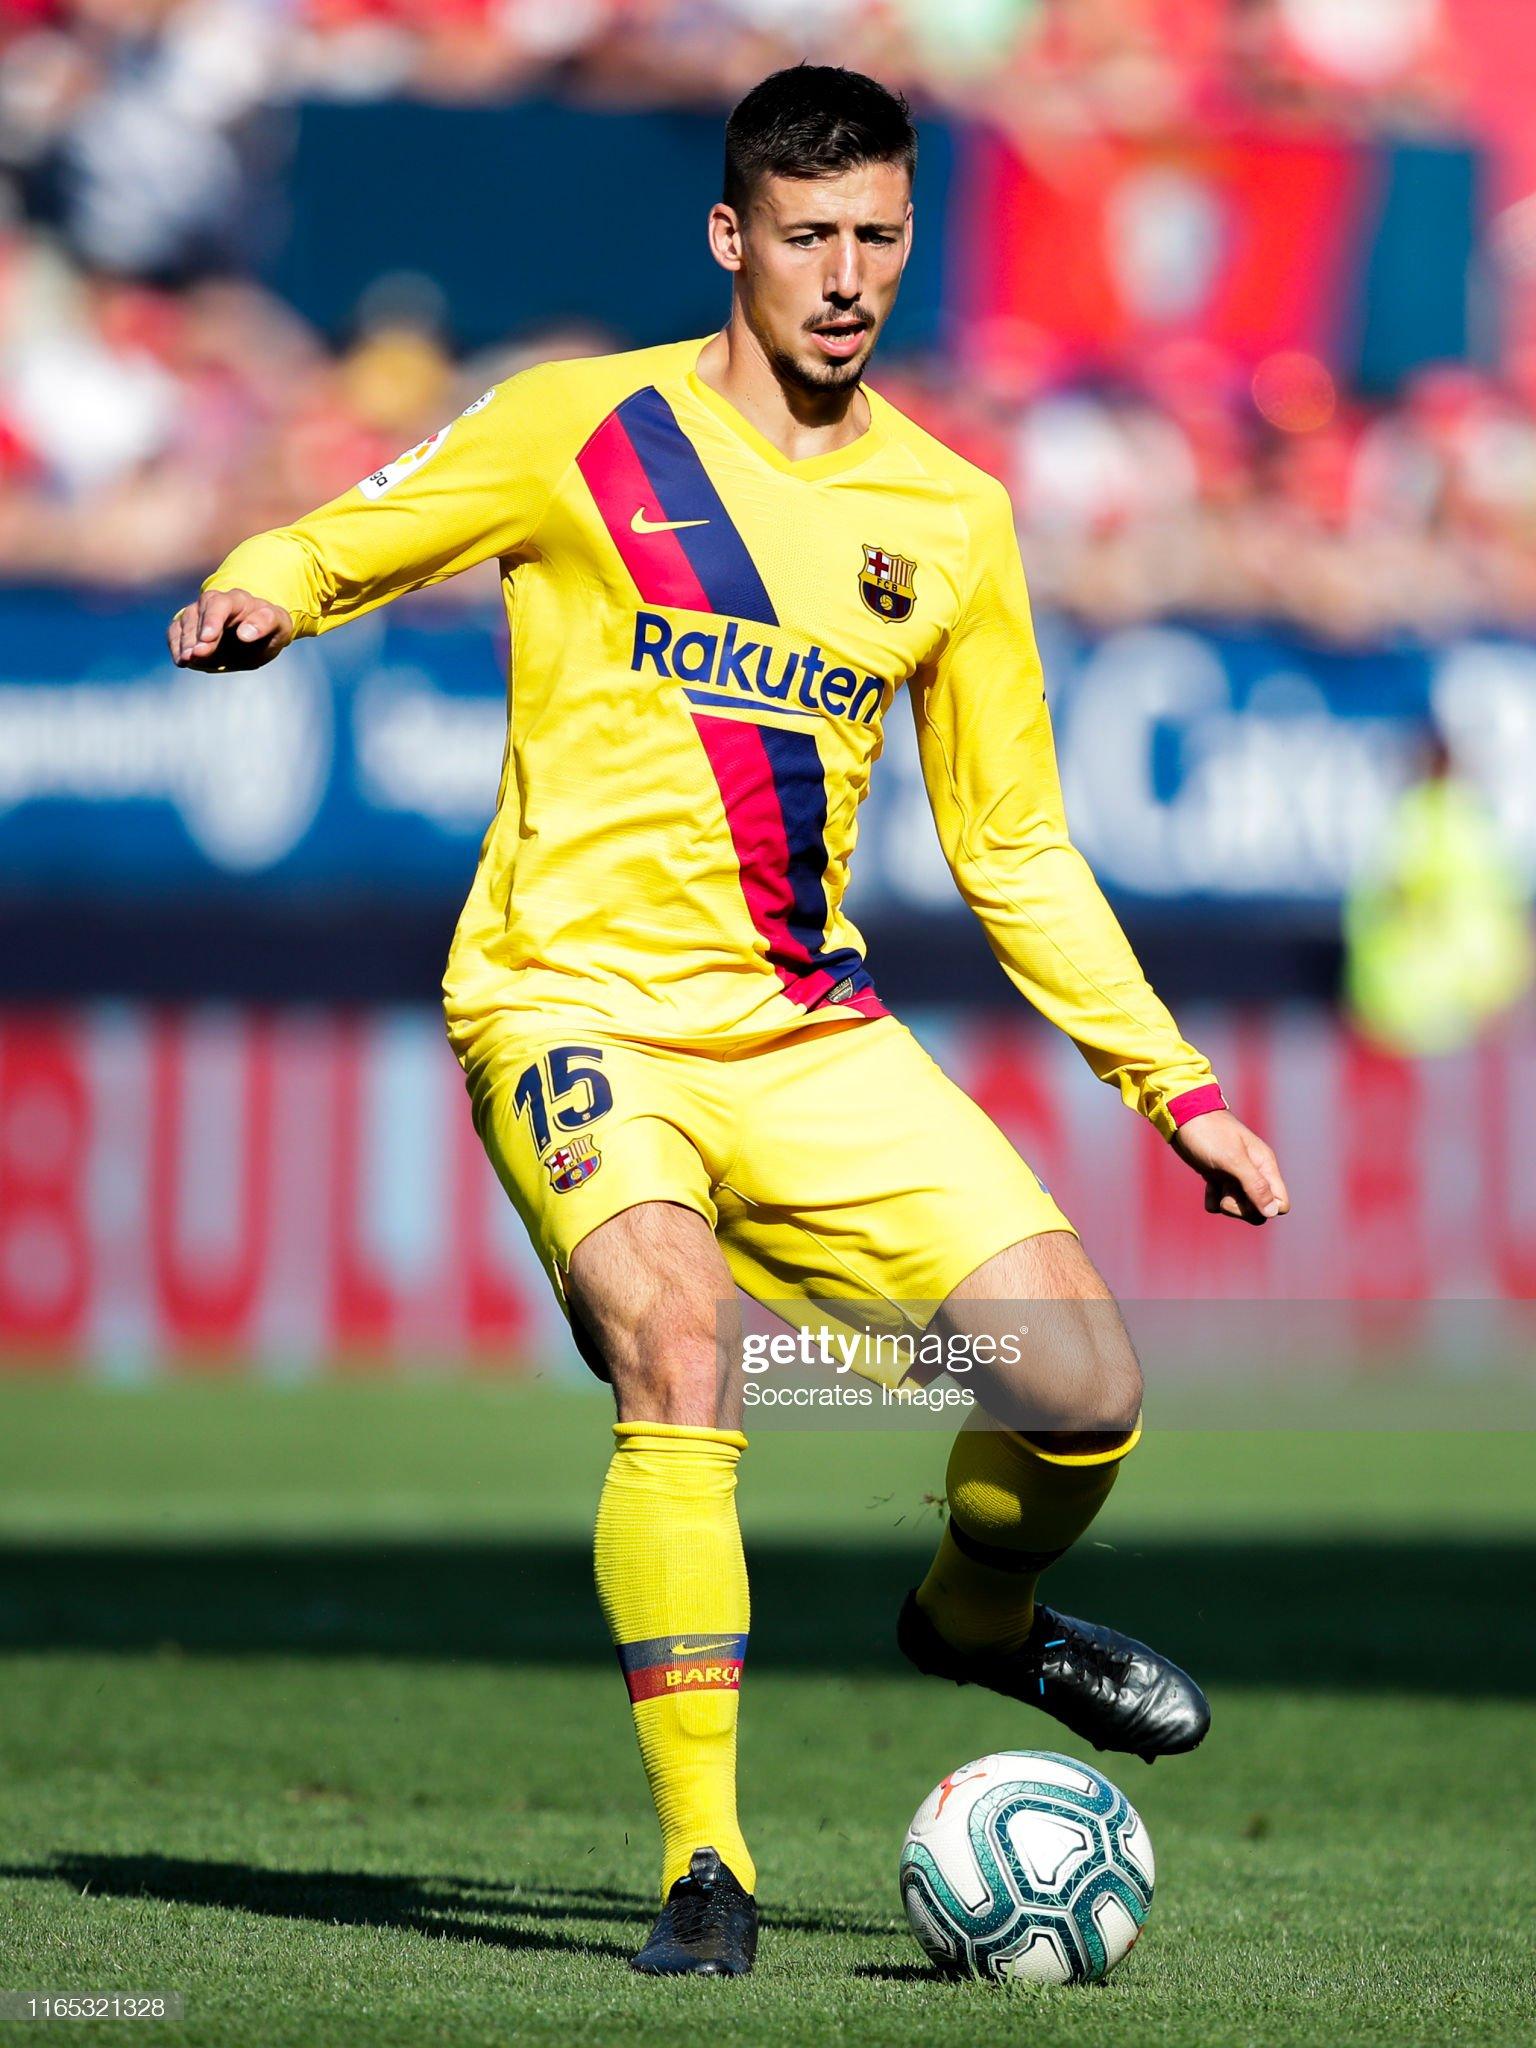 صور مباراة : أوساسونا - برشلونة 2-2 ( 31-08-2019 )  Clement-lenglet-of-fc-barcelona-during-the-la-liga-santander-match-picture-id1165321328?s=2048x2048